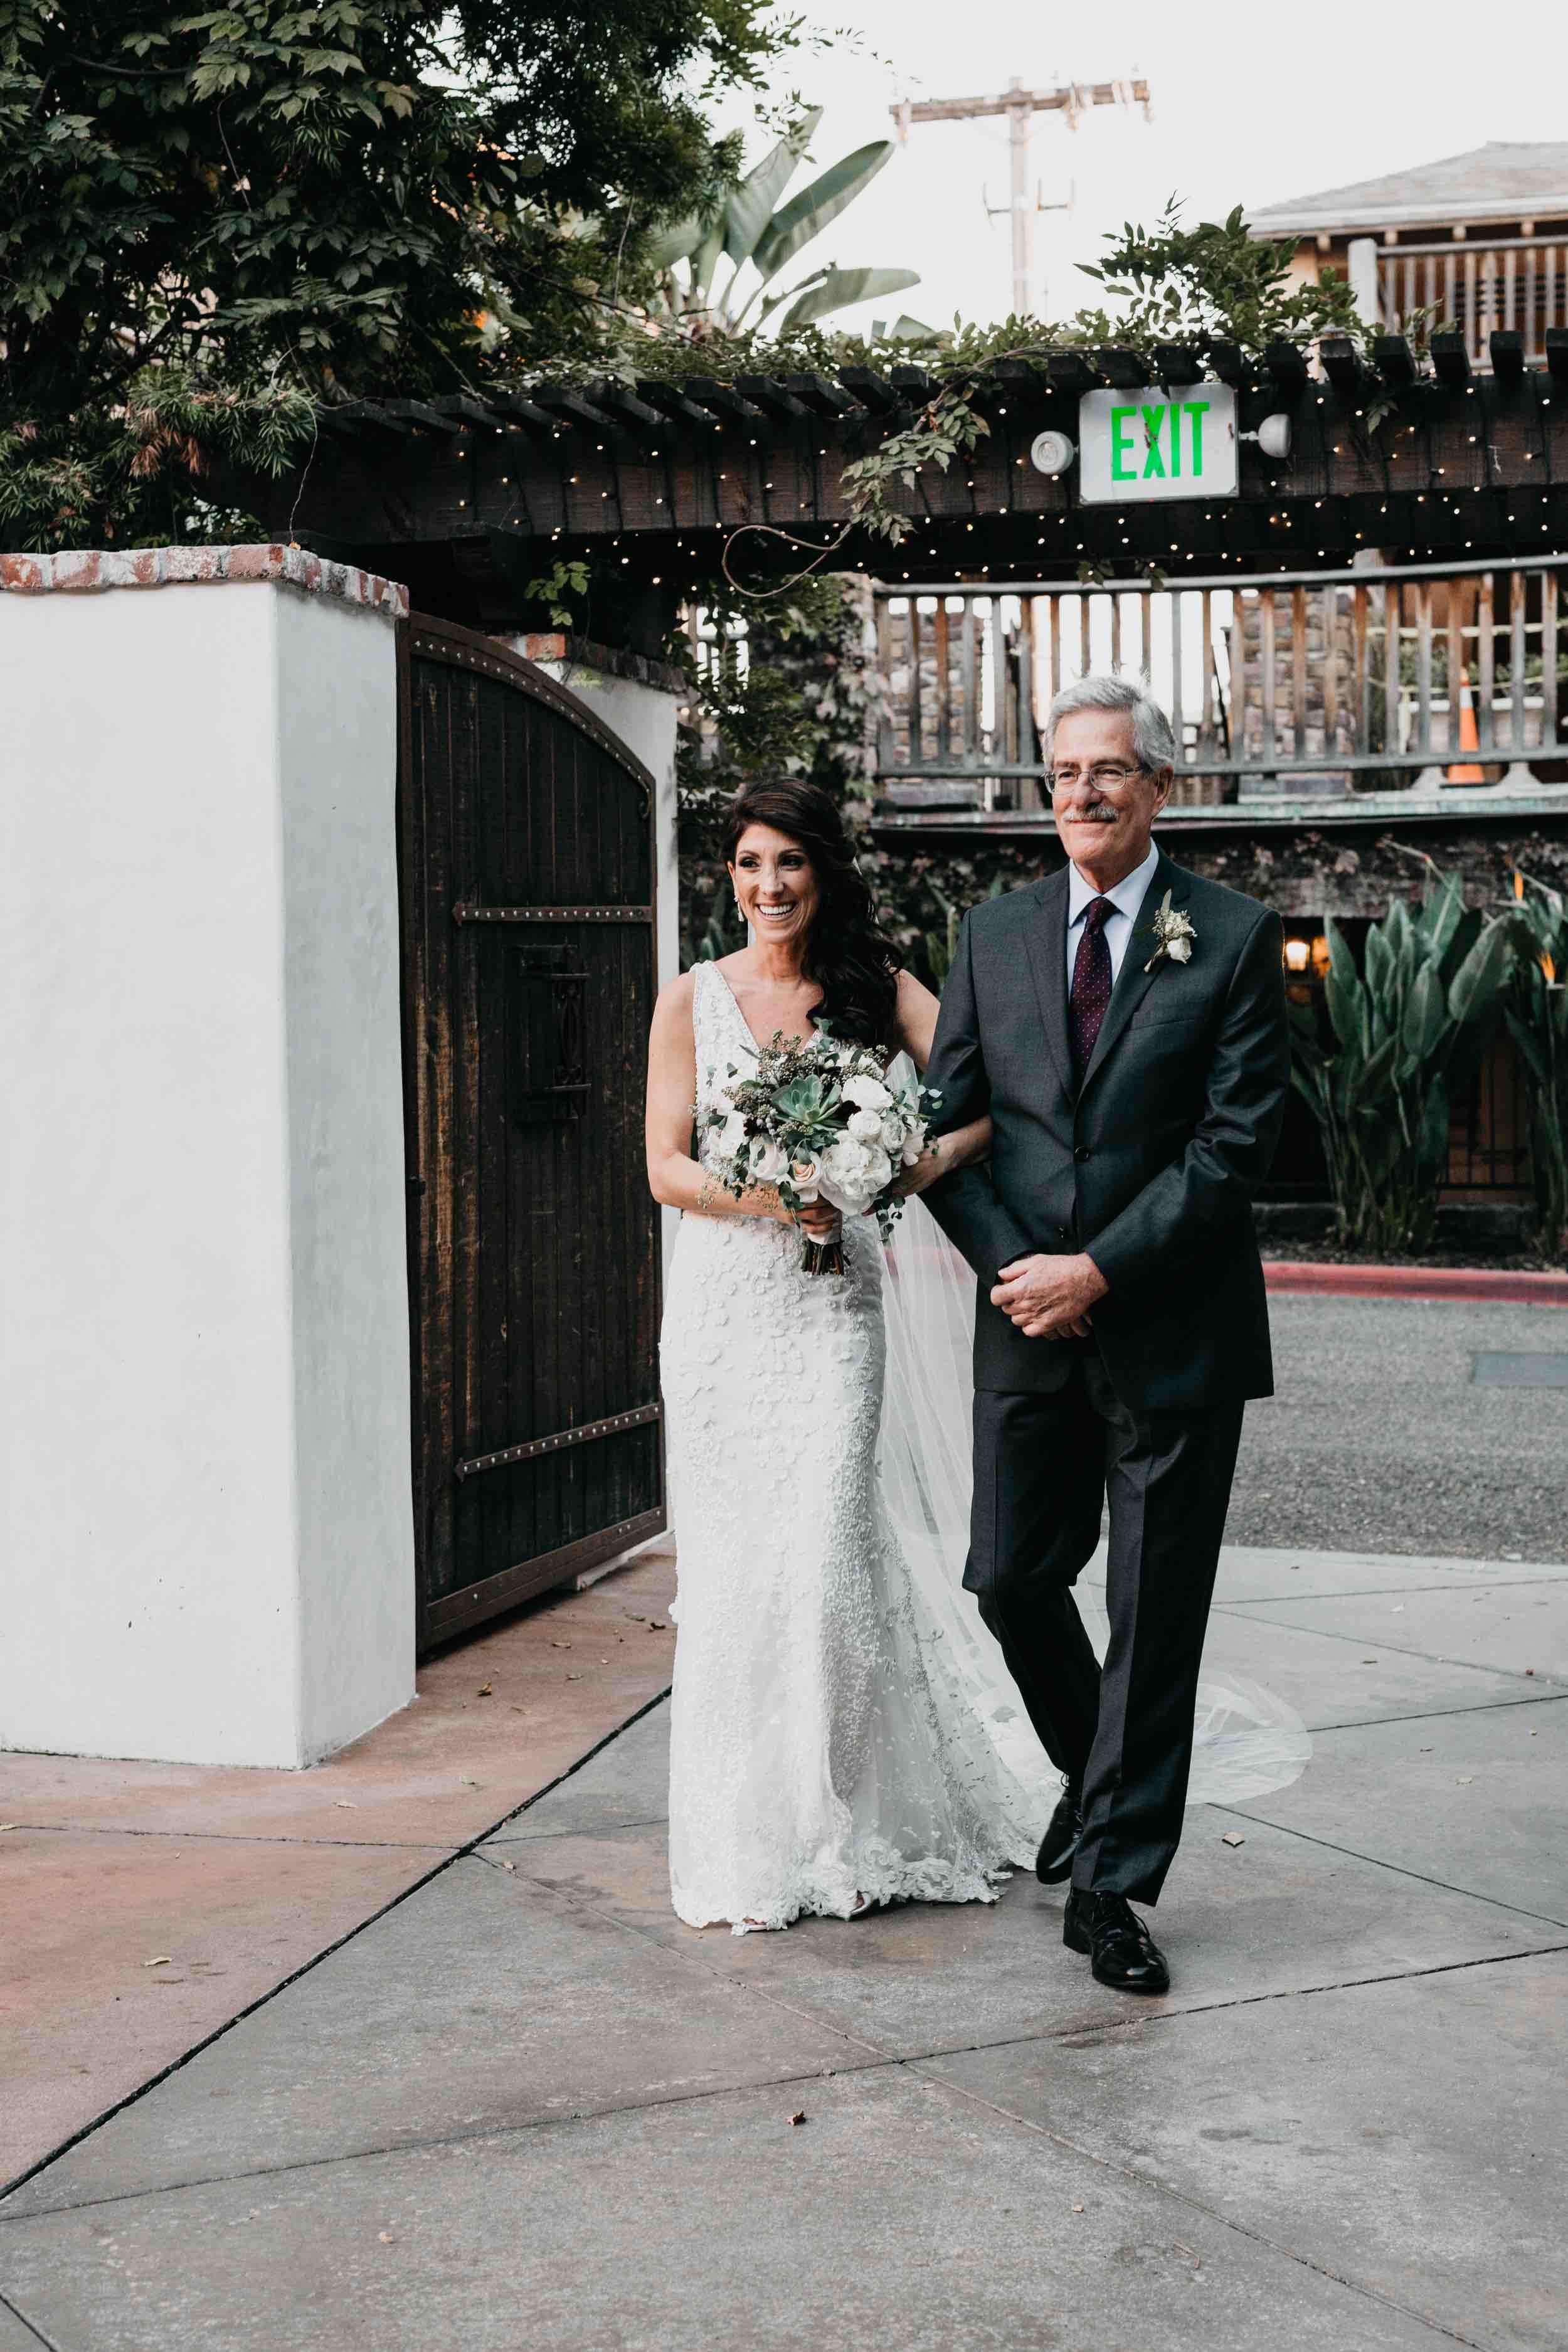 Laura&Don_Ceremony103.jpeg